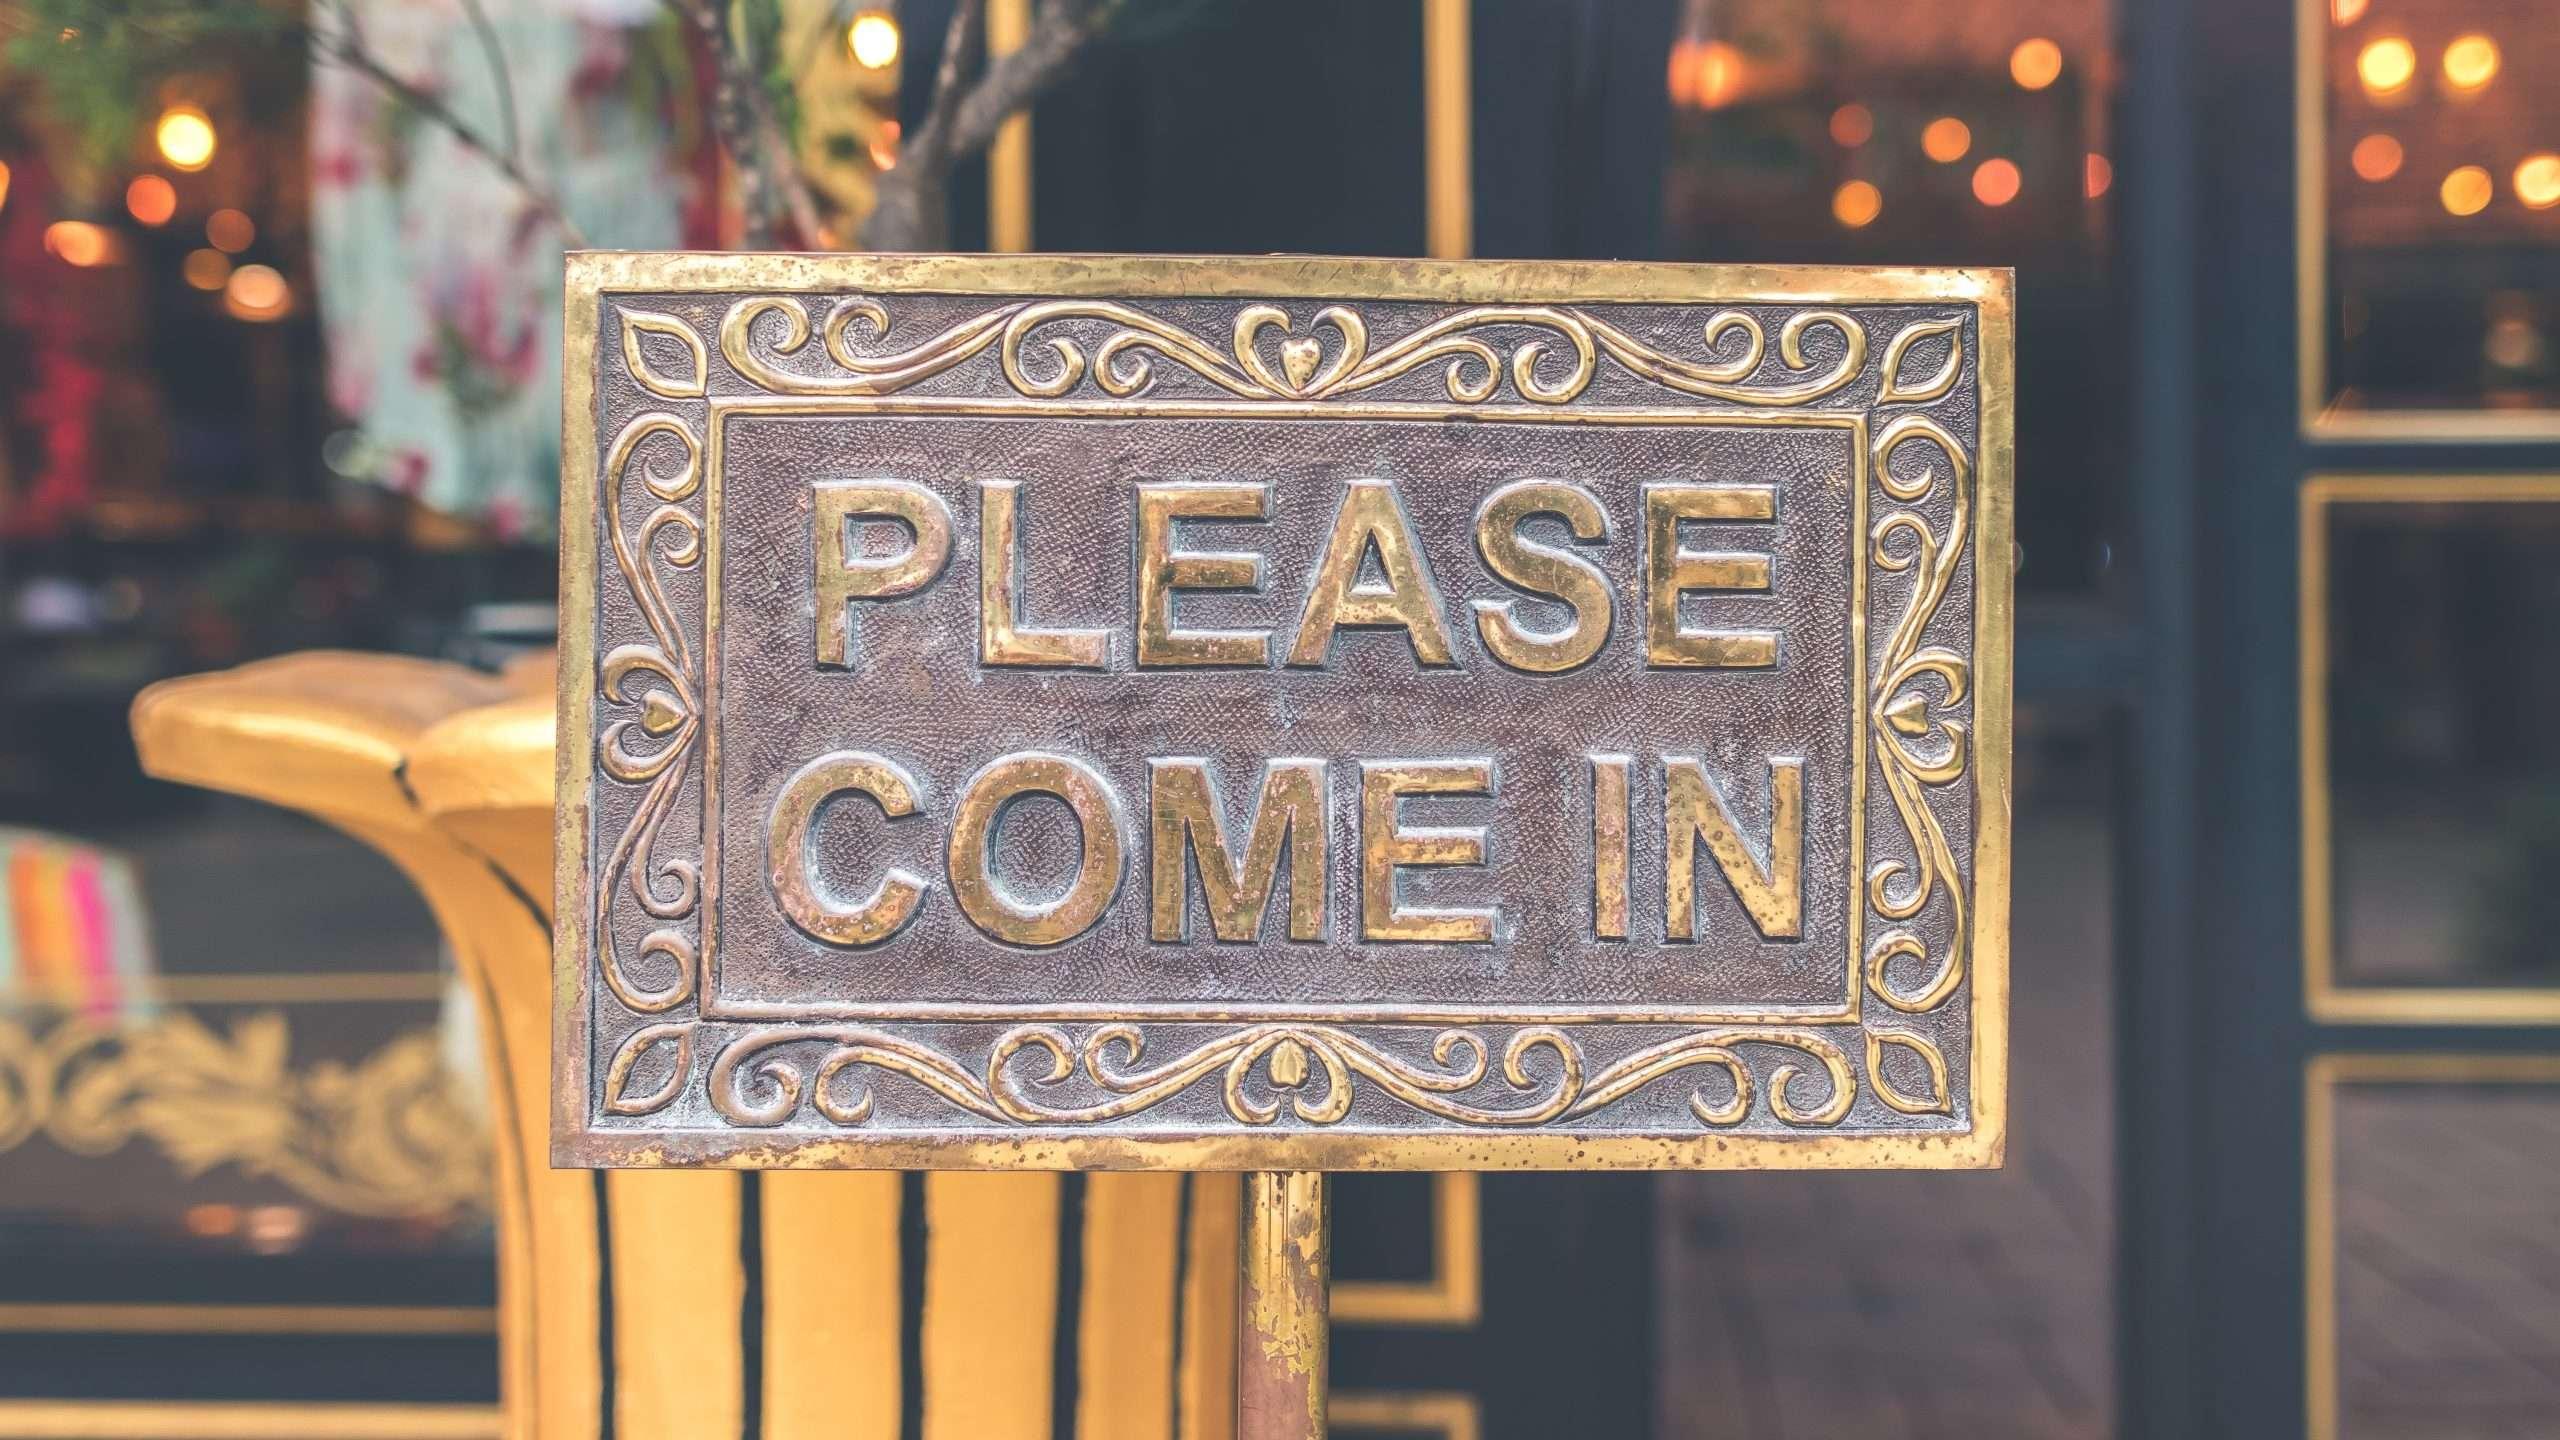 Furniture store welcome-in board